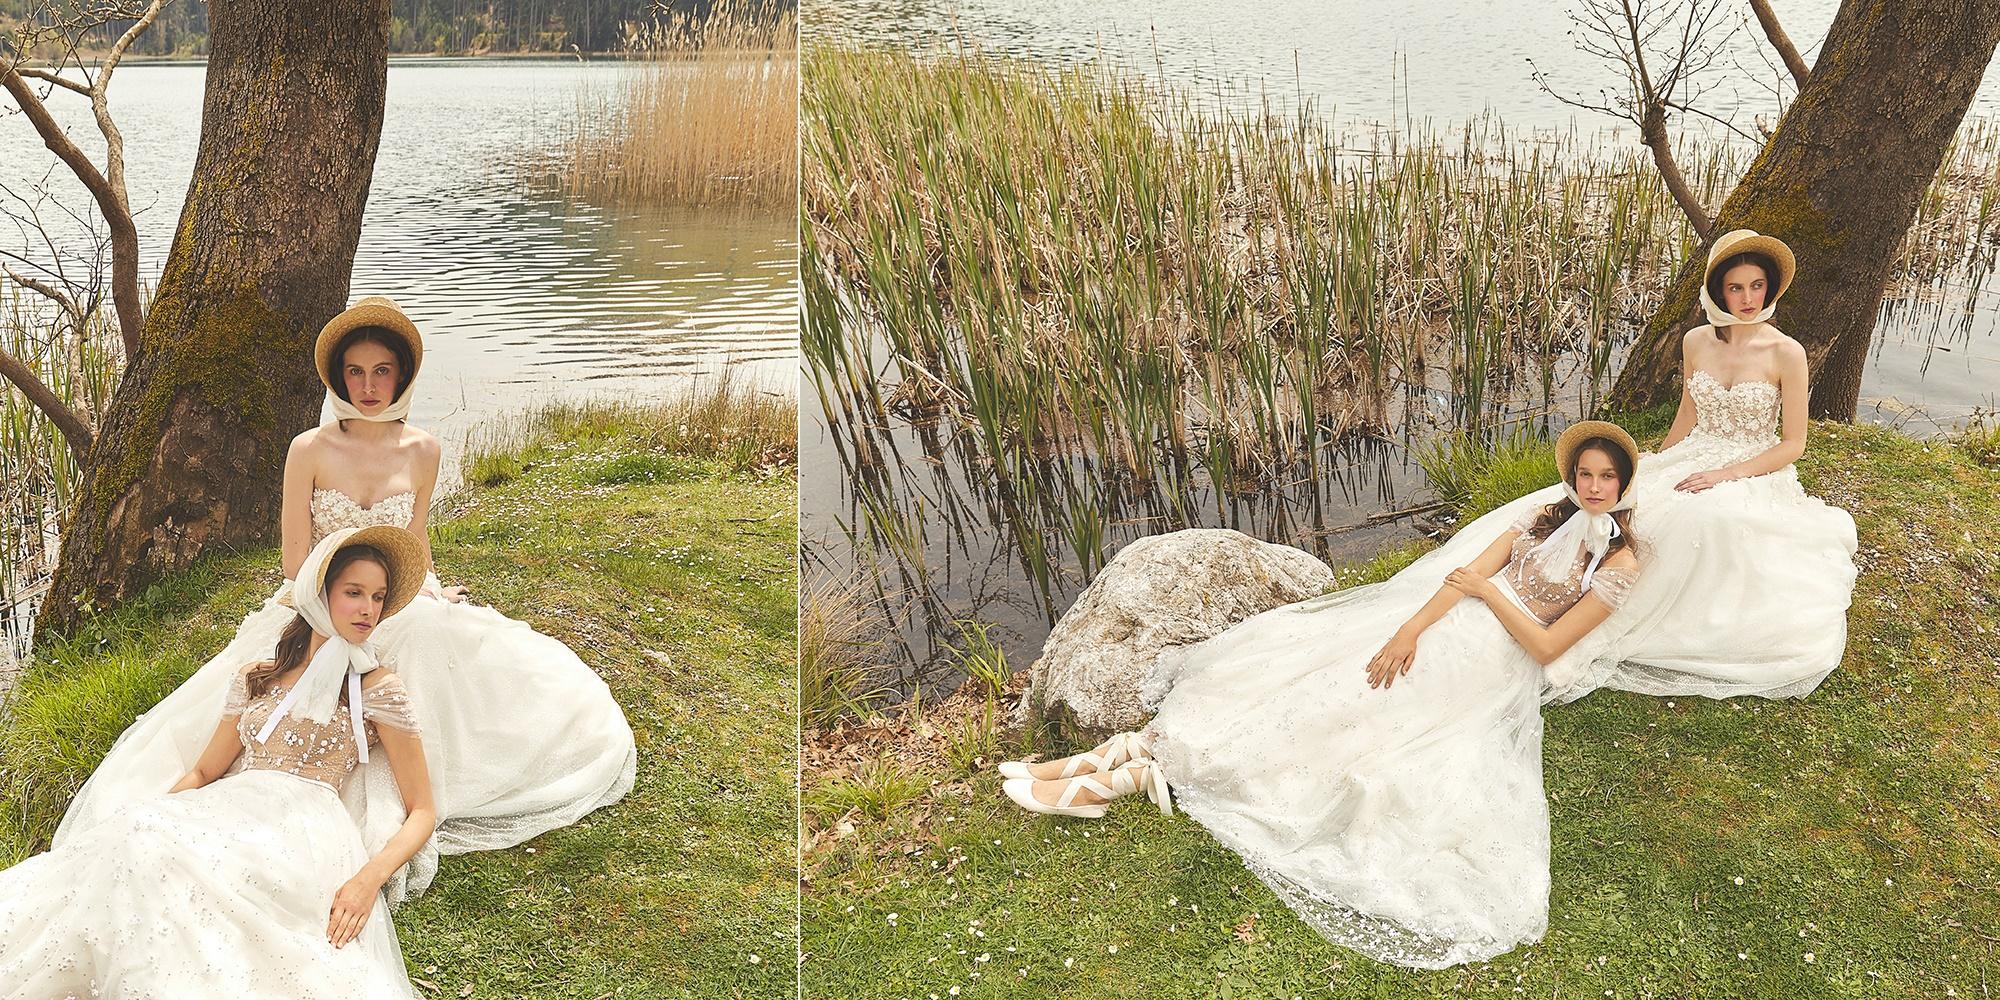 Dreamy wedding dresses by Mairi Mparola